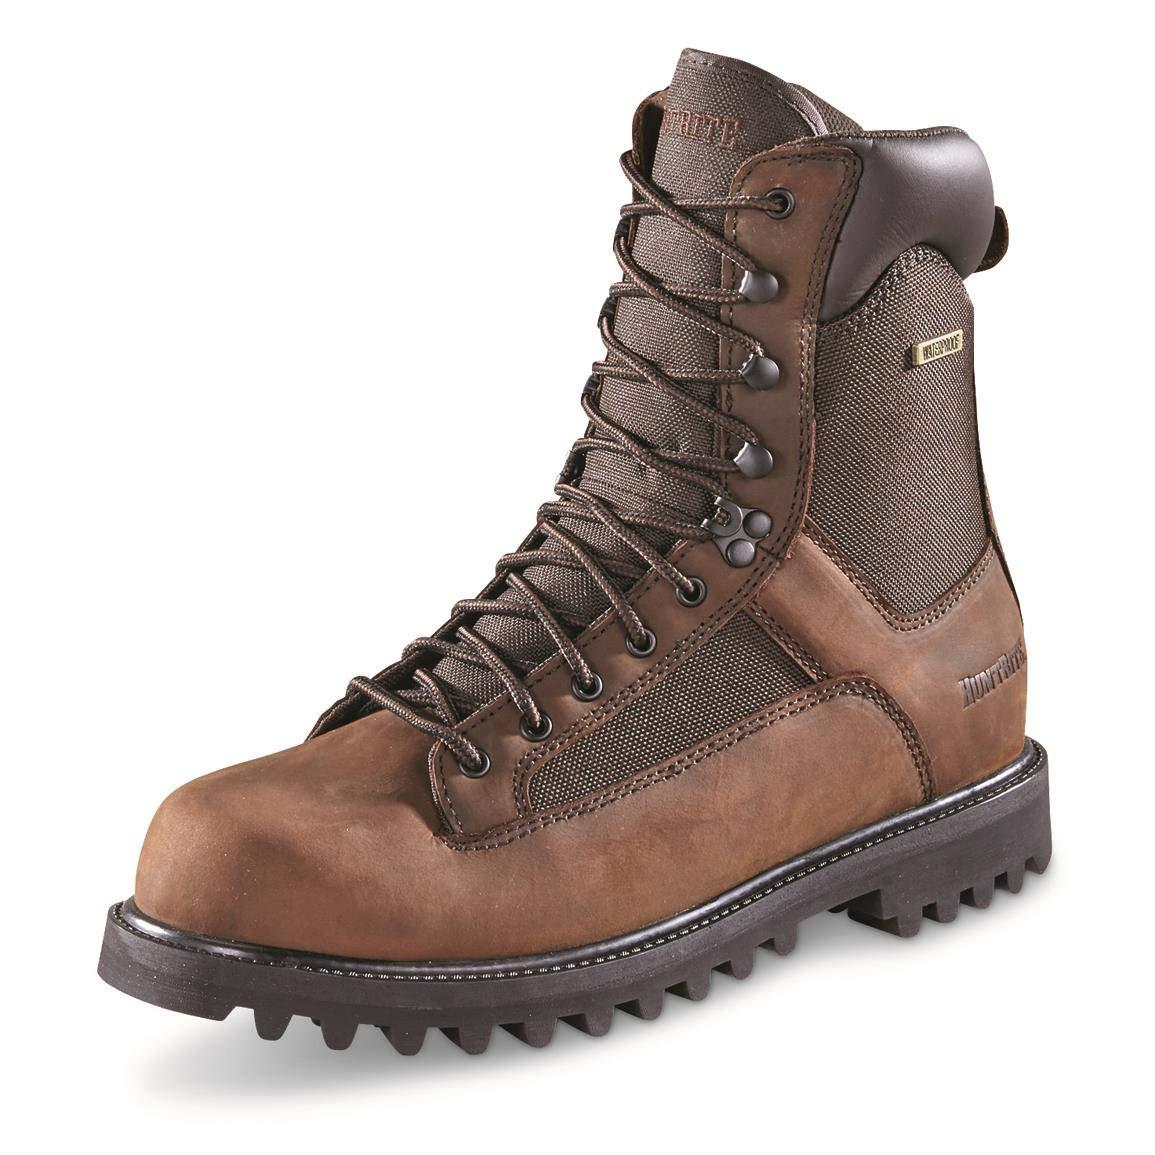 Huntrite Men's Insulated Waterproof Sport Boots, 1,200 Gram